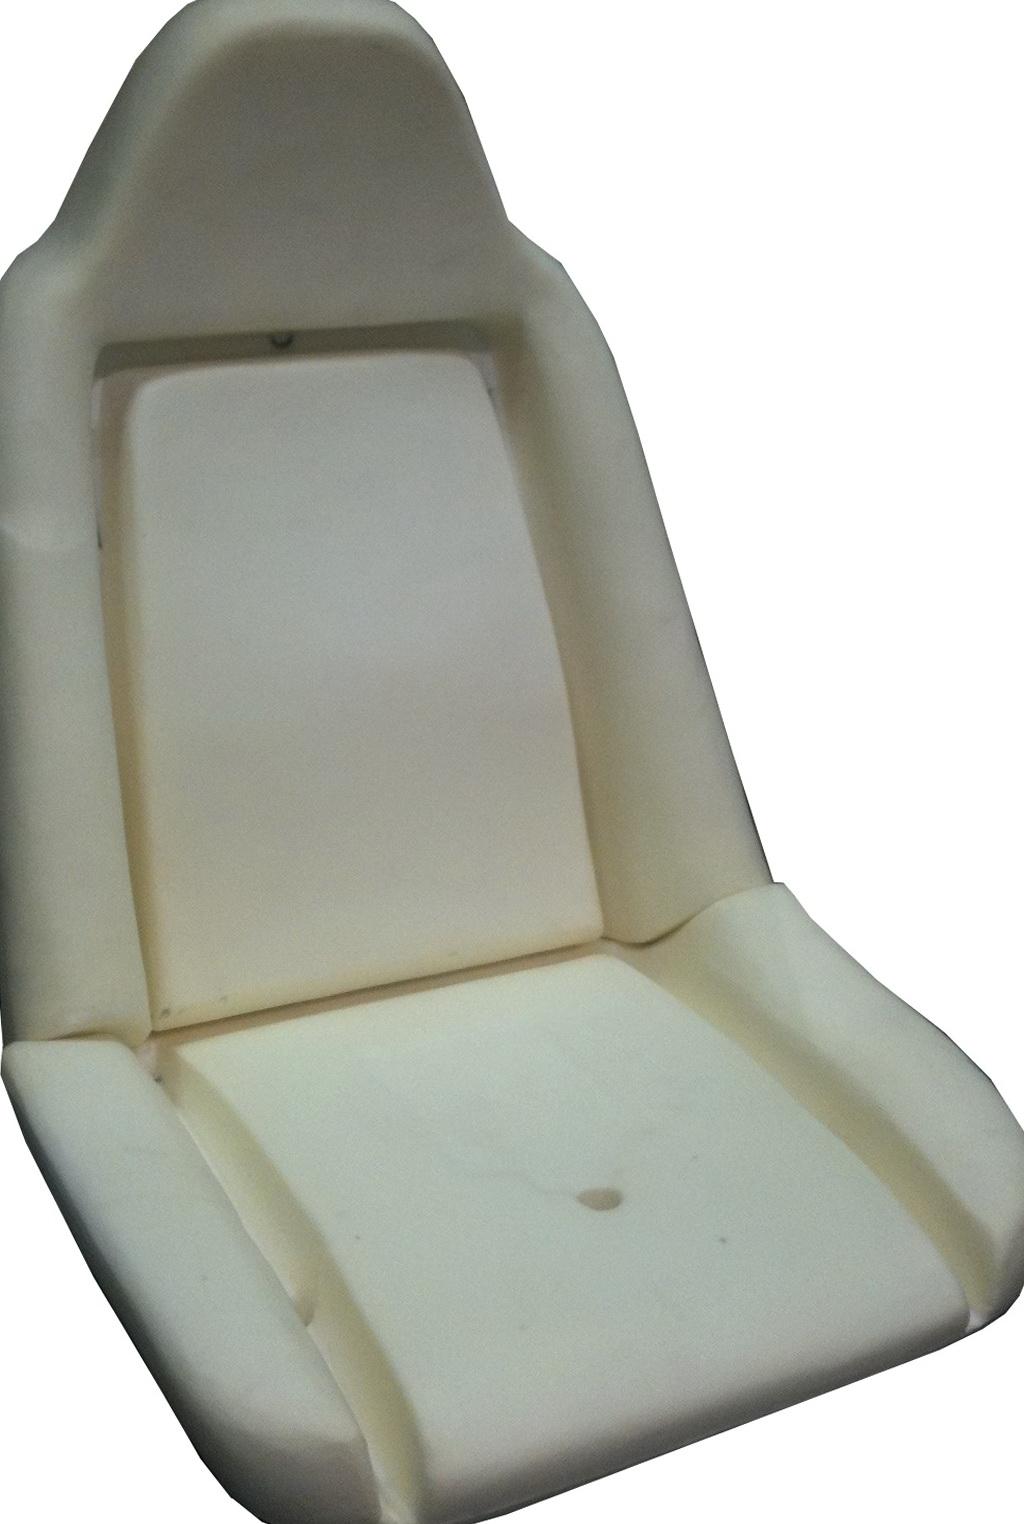 Auto Seat Cushion Foam Replacement Home Design Ideas